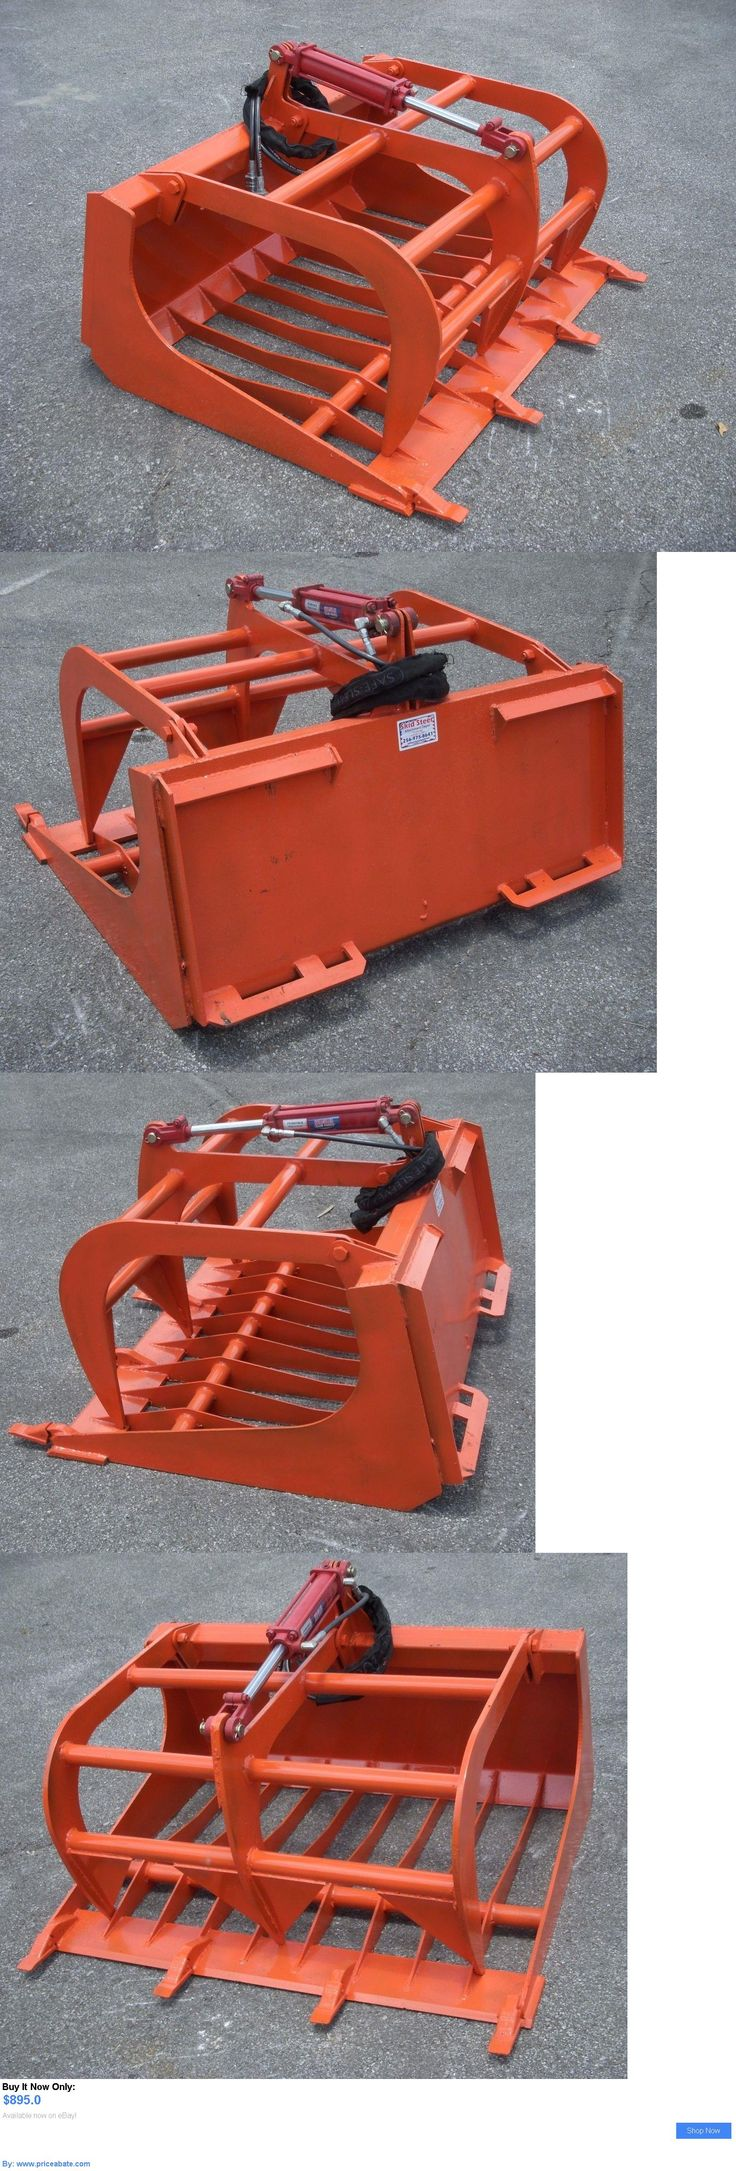 heavy equipment: Kubota Compact Tractor Loader Attachment - 48 Rock Bucket Grapple - Free Ship!! BUY IT NOW ONLY: $895.0 #priceabateheavyequipment OR #priceabate